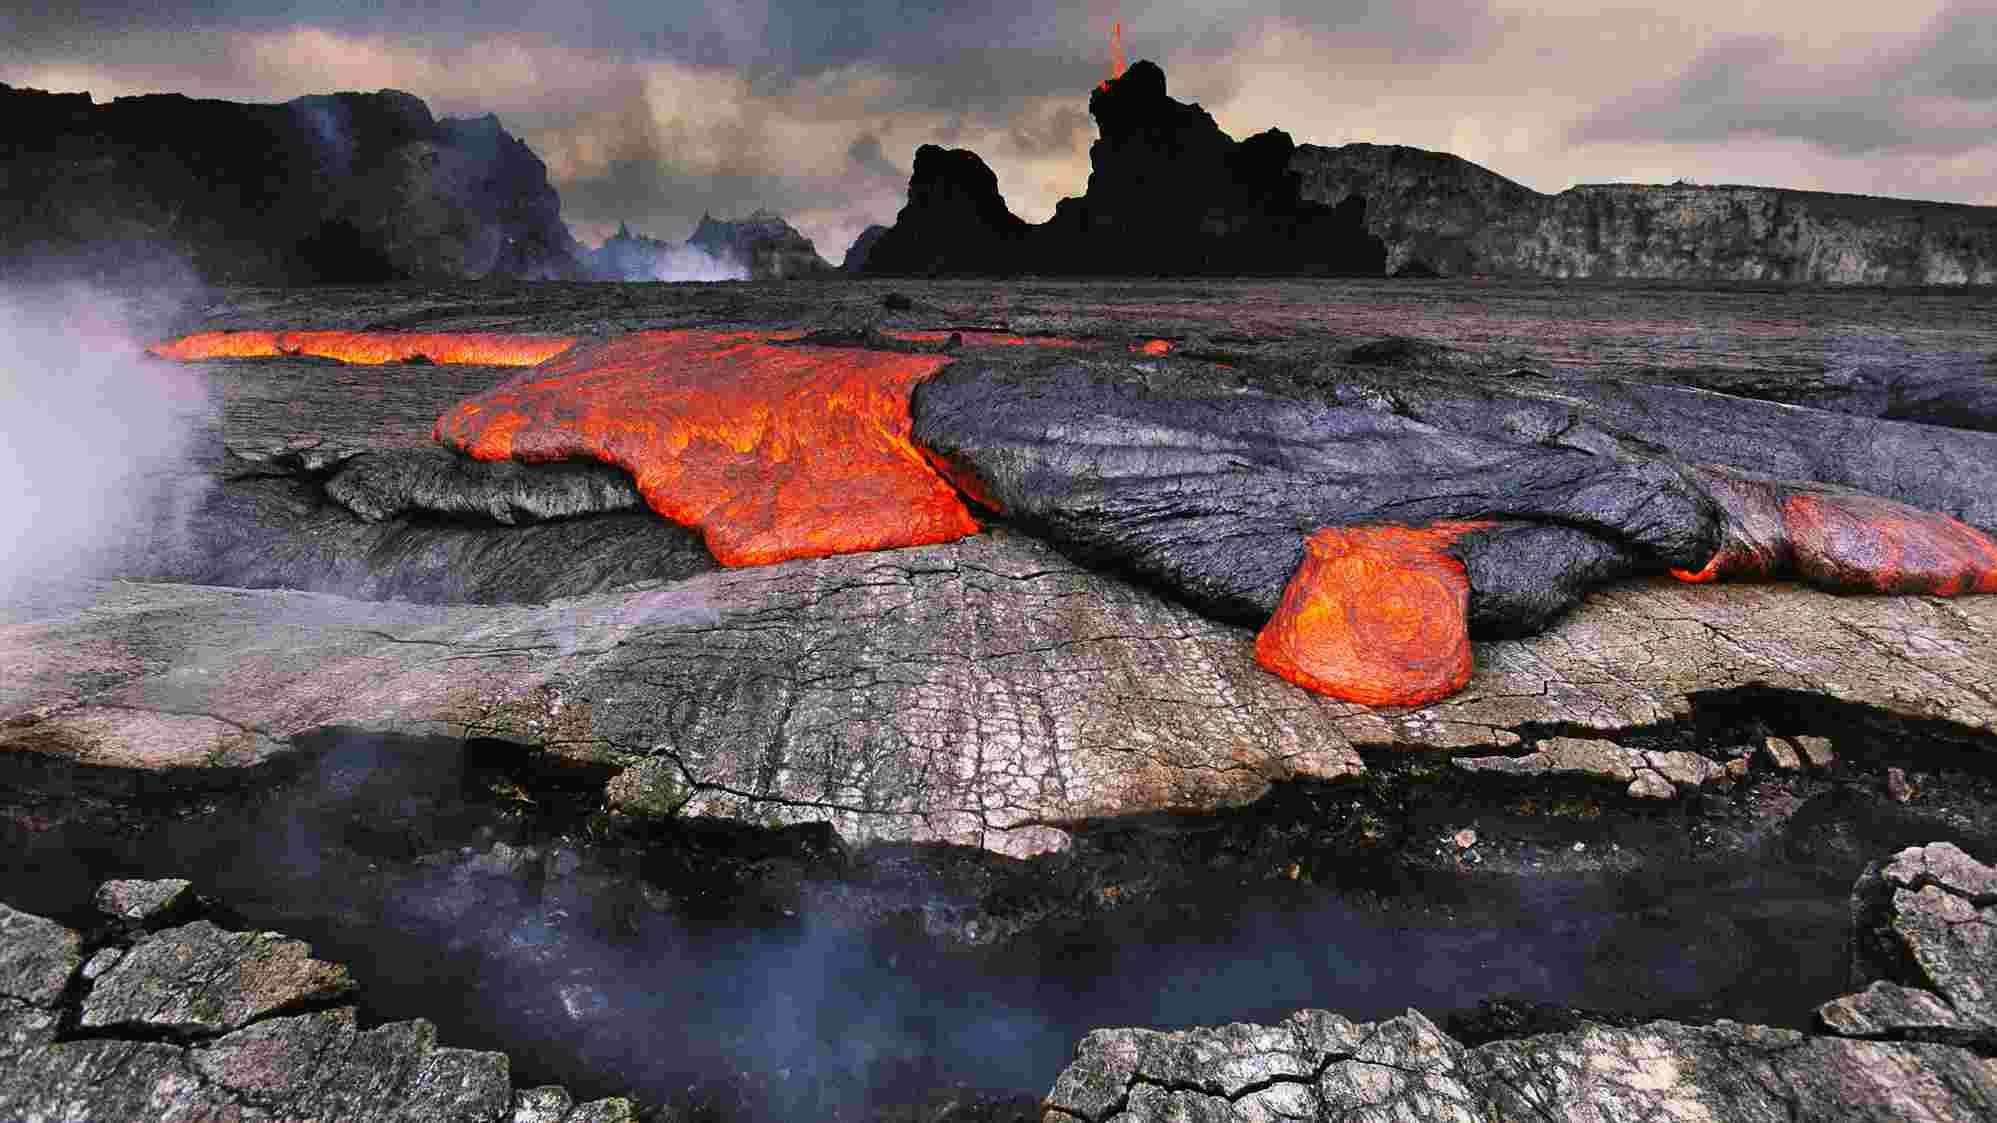 Tourists visit Hawaii volcano park despite federal shutdown